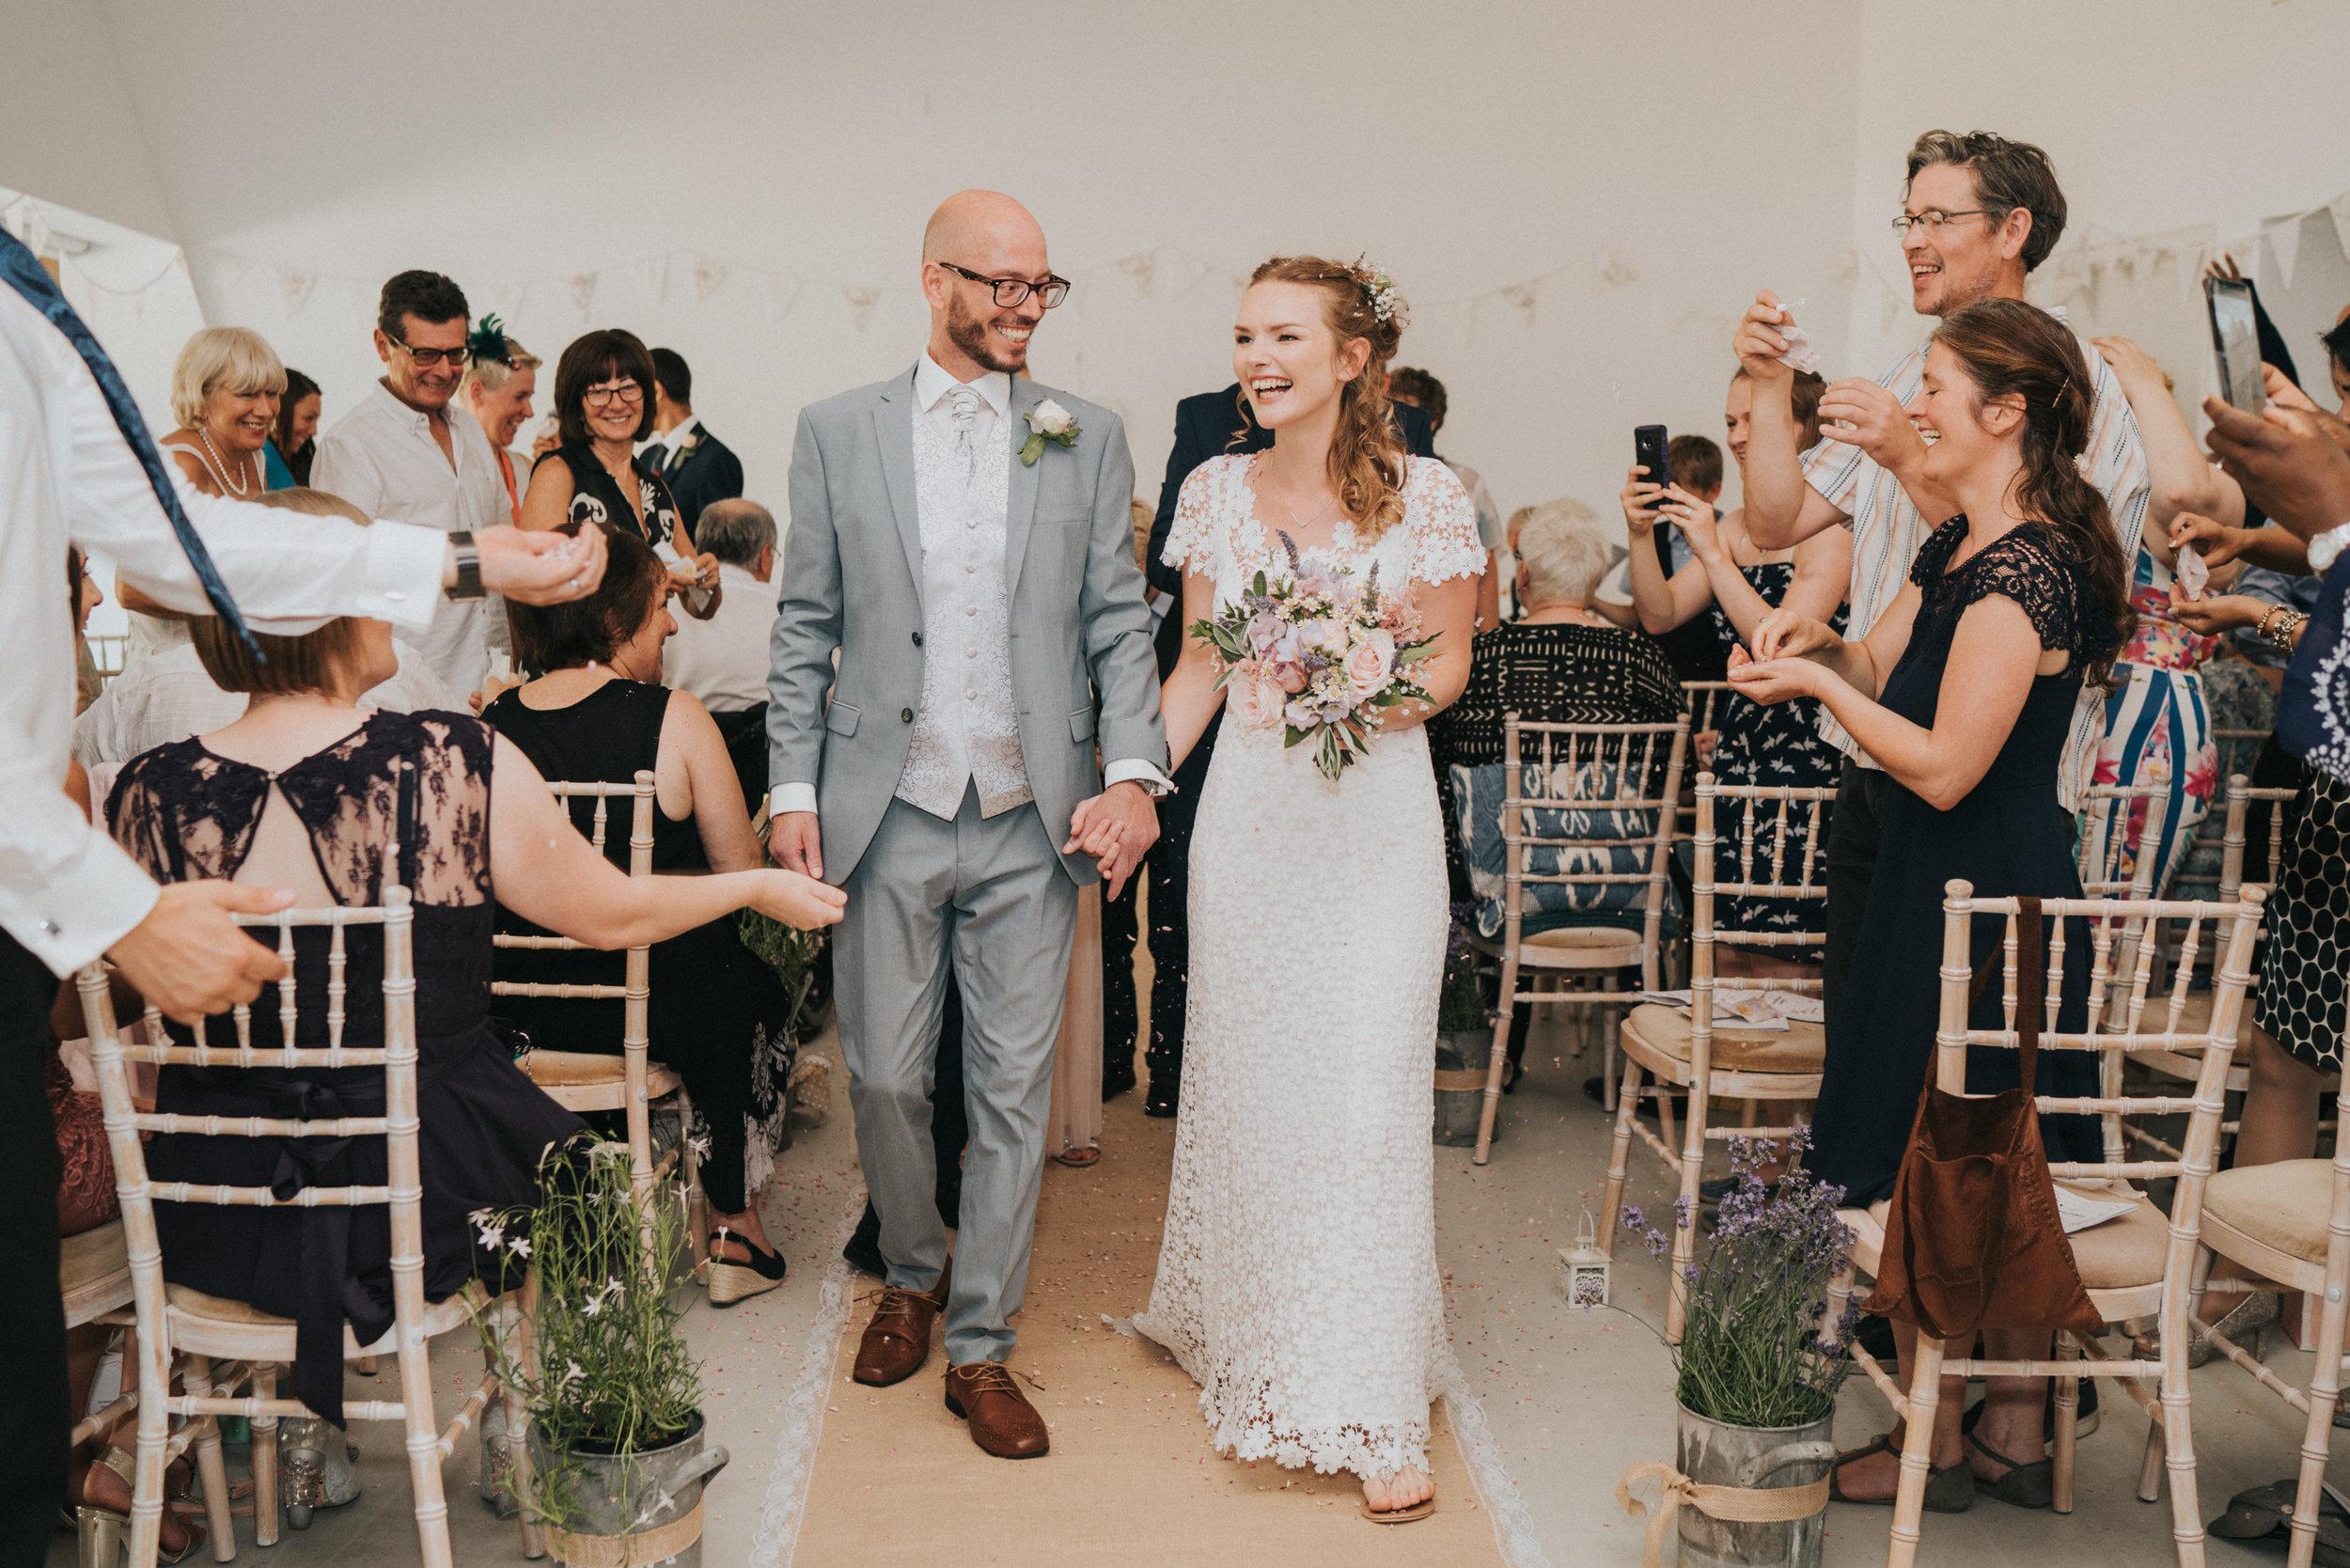 Grace-Elizabeth-Georgie-Amalaketu-Firstsite-Colchester-Essex-Boho-Buddhist-Wedding-Alternative-Wedding-Photography-Essex (66 of 100).jpg